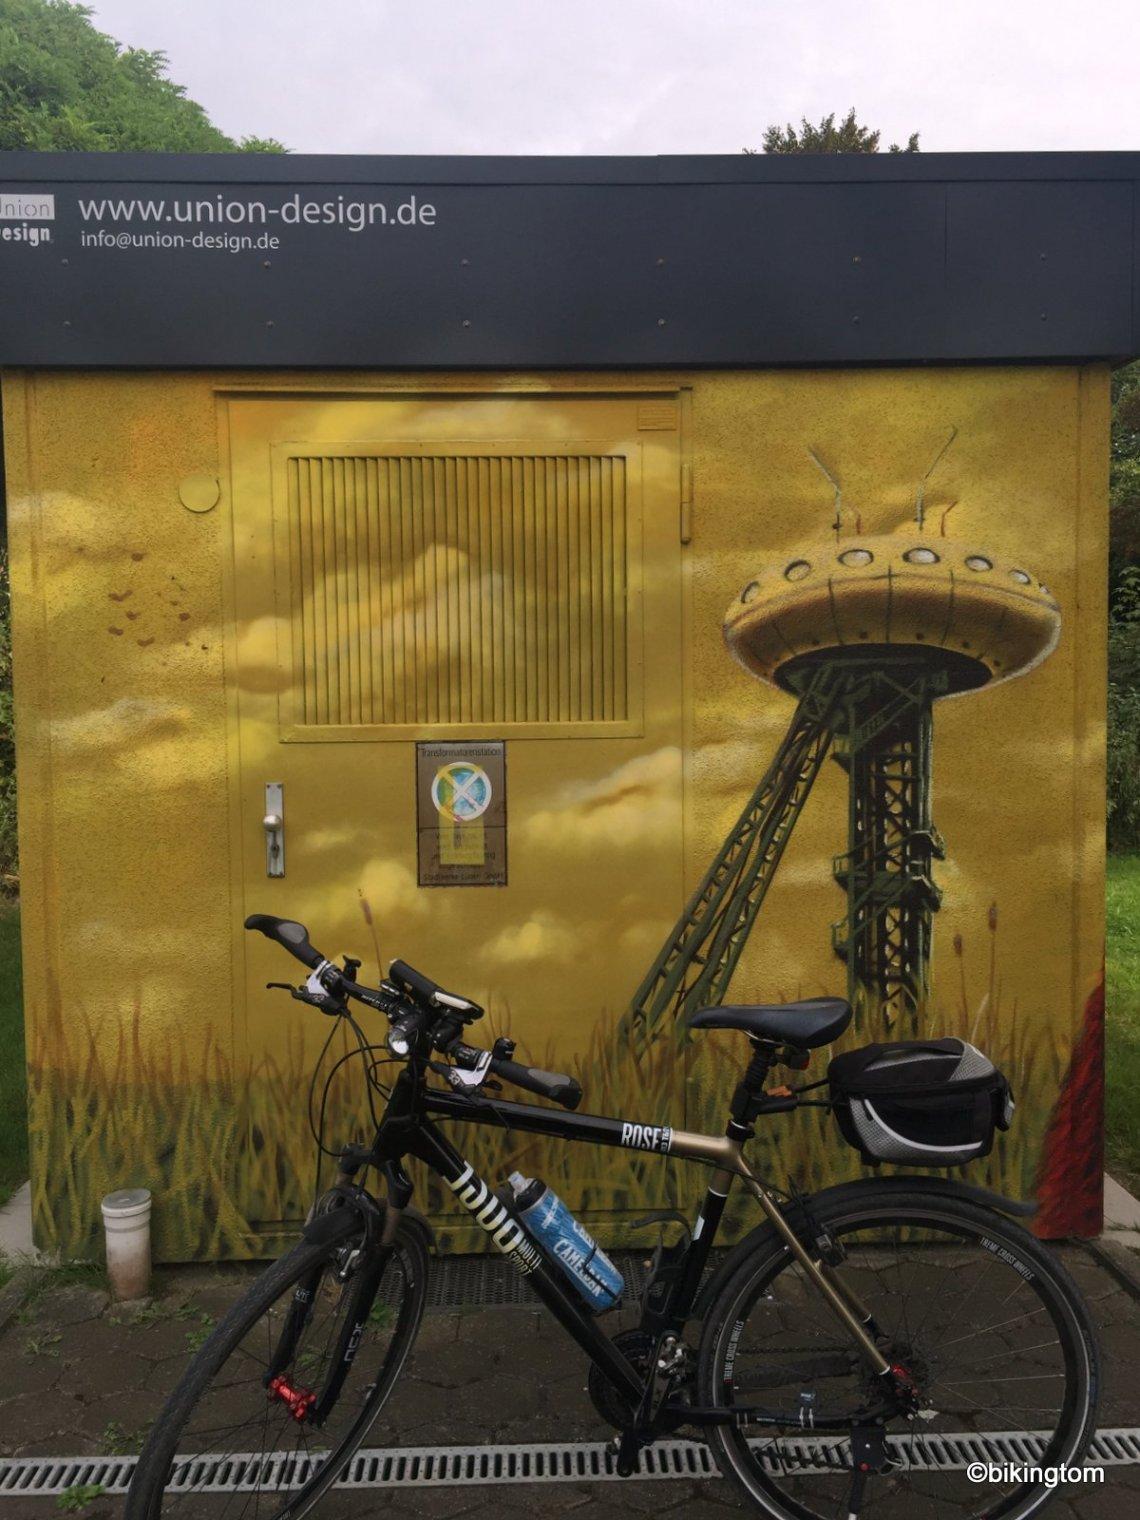 Fahrradtour bikingtom Kamen Werne Lünen Colani Ufo Colani-Ei